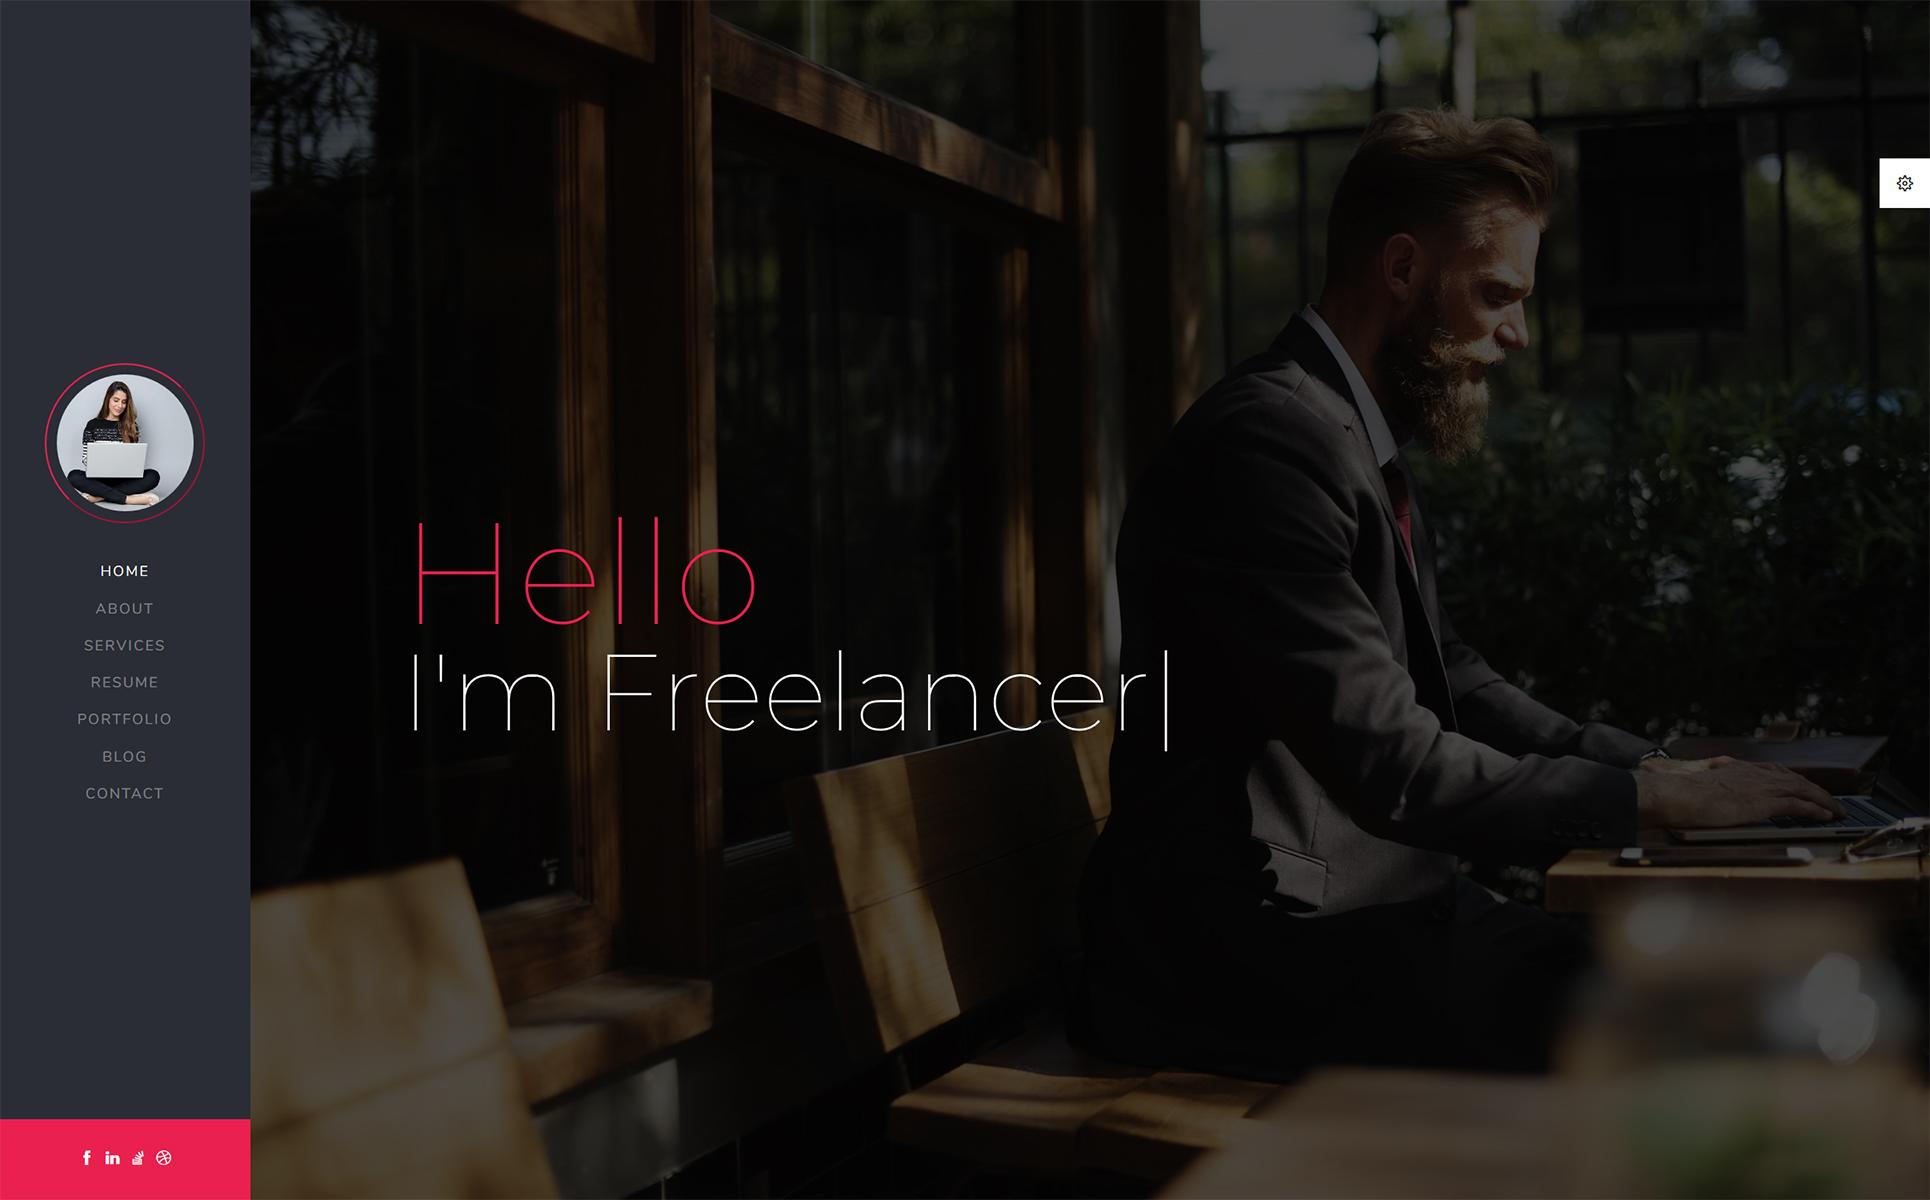 CV/Resume Landing Page Template